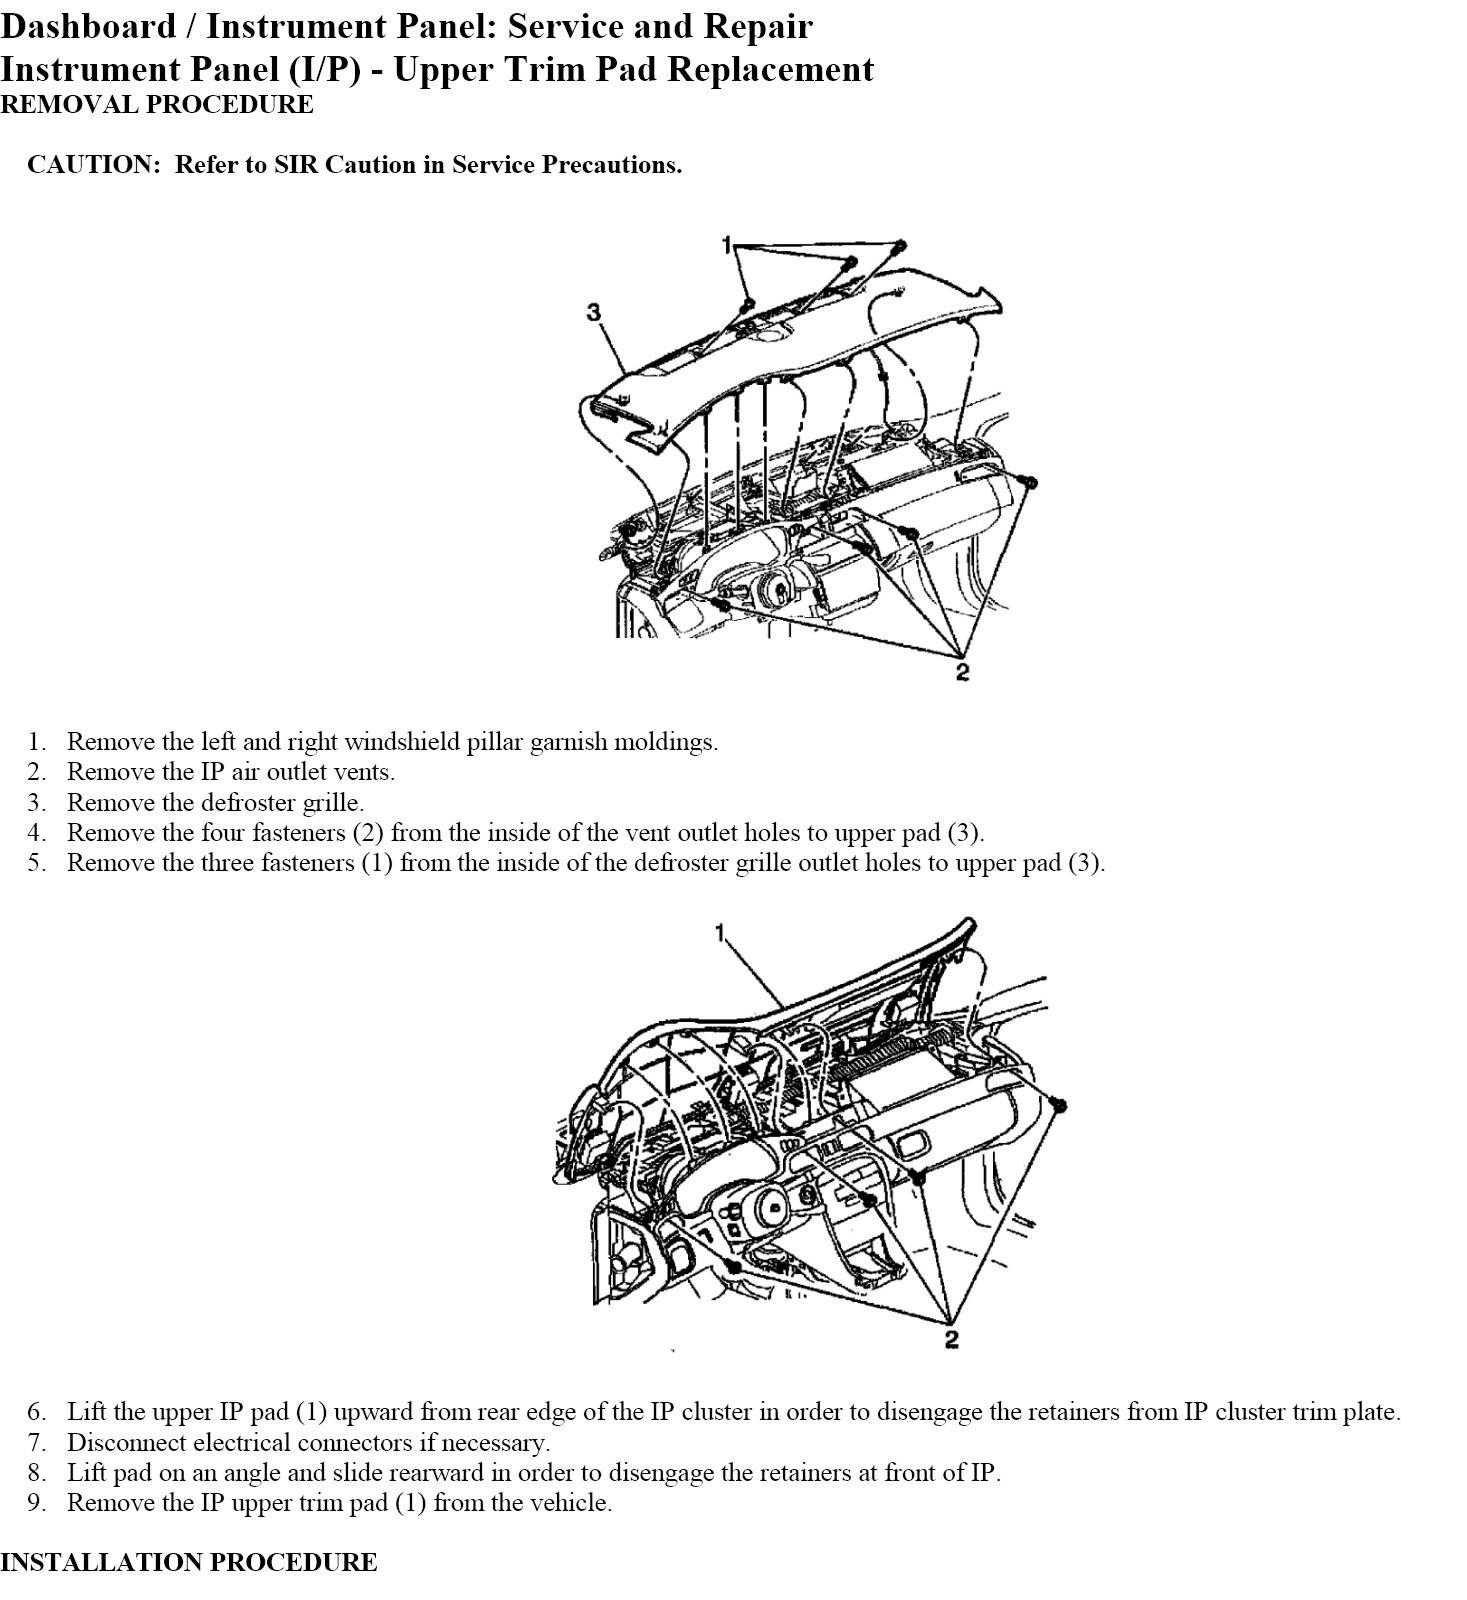 2002 Cadillac Deville. How Do I Remove The Immitation